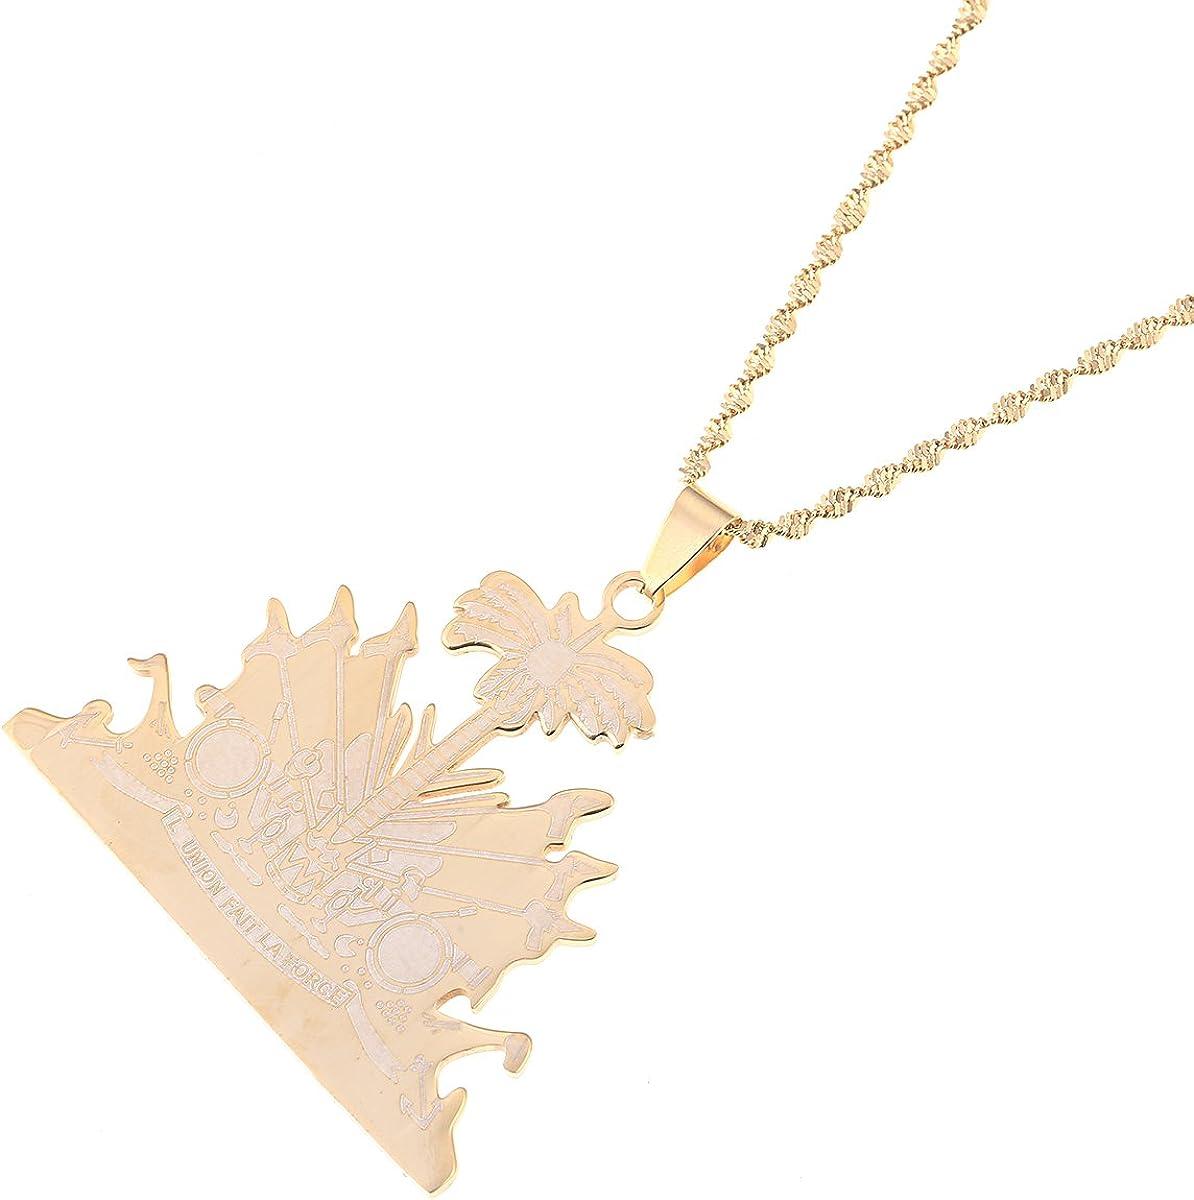 Stainless Steel Haiti Pendant and Necklace Ayiti Items Haiti Jewelry